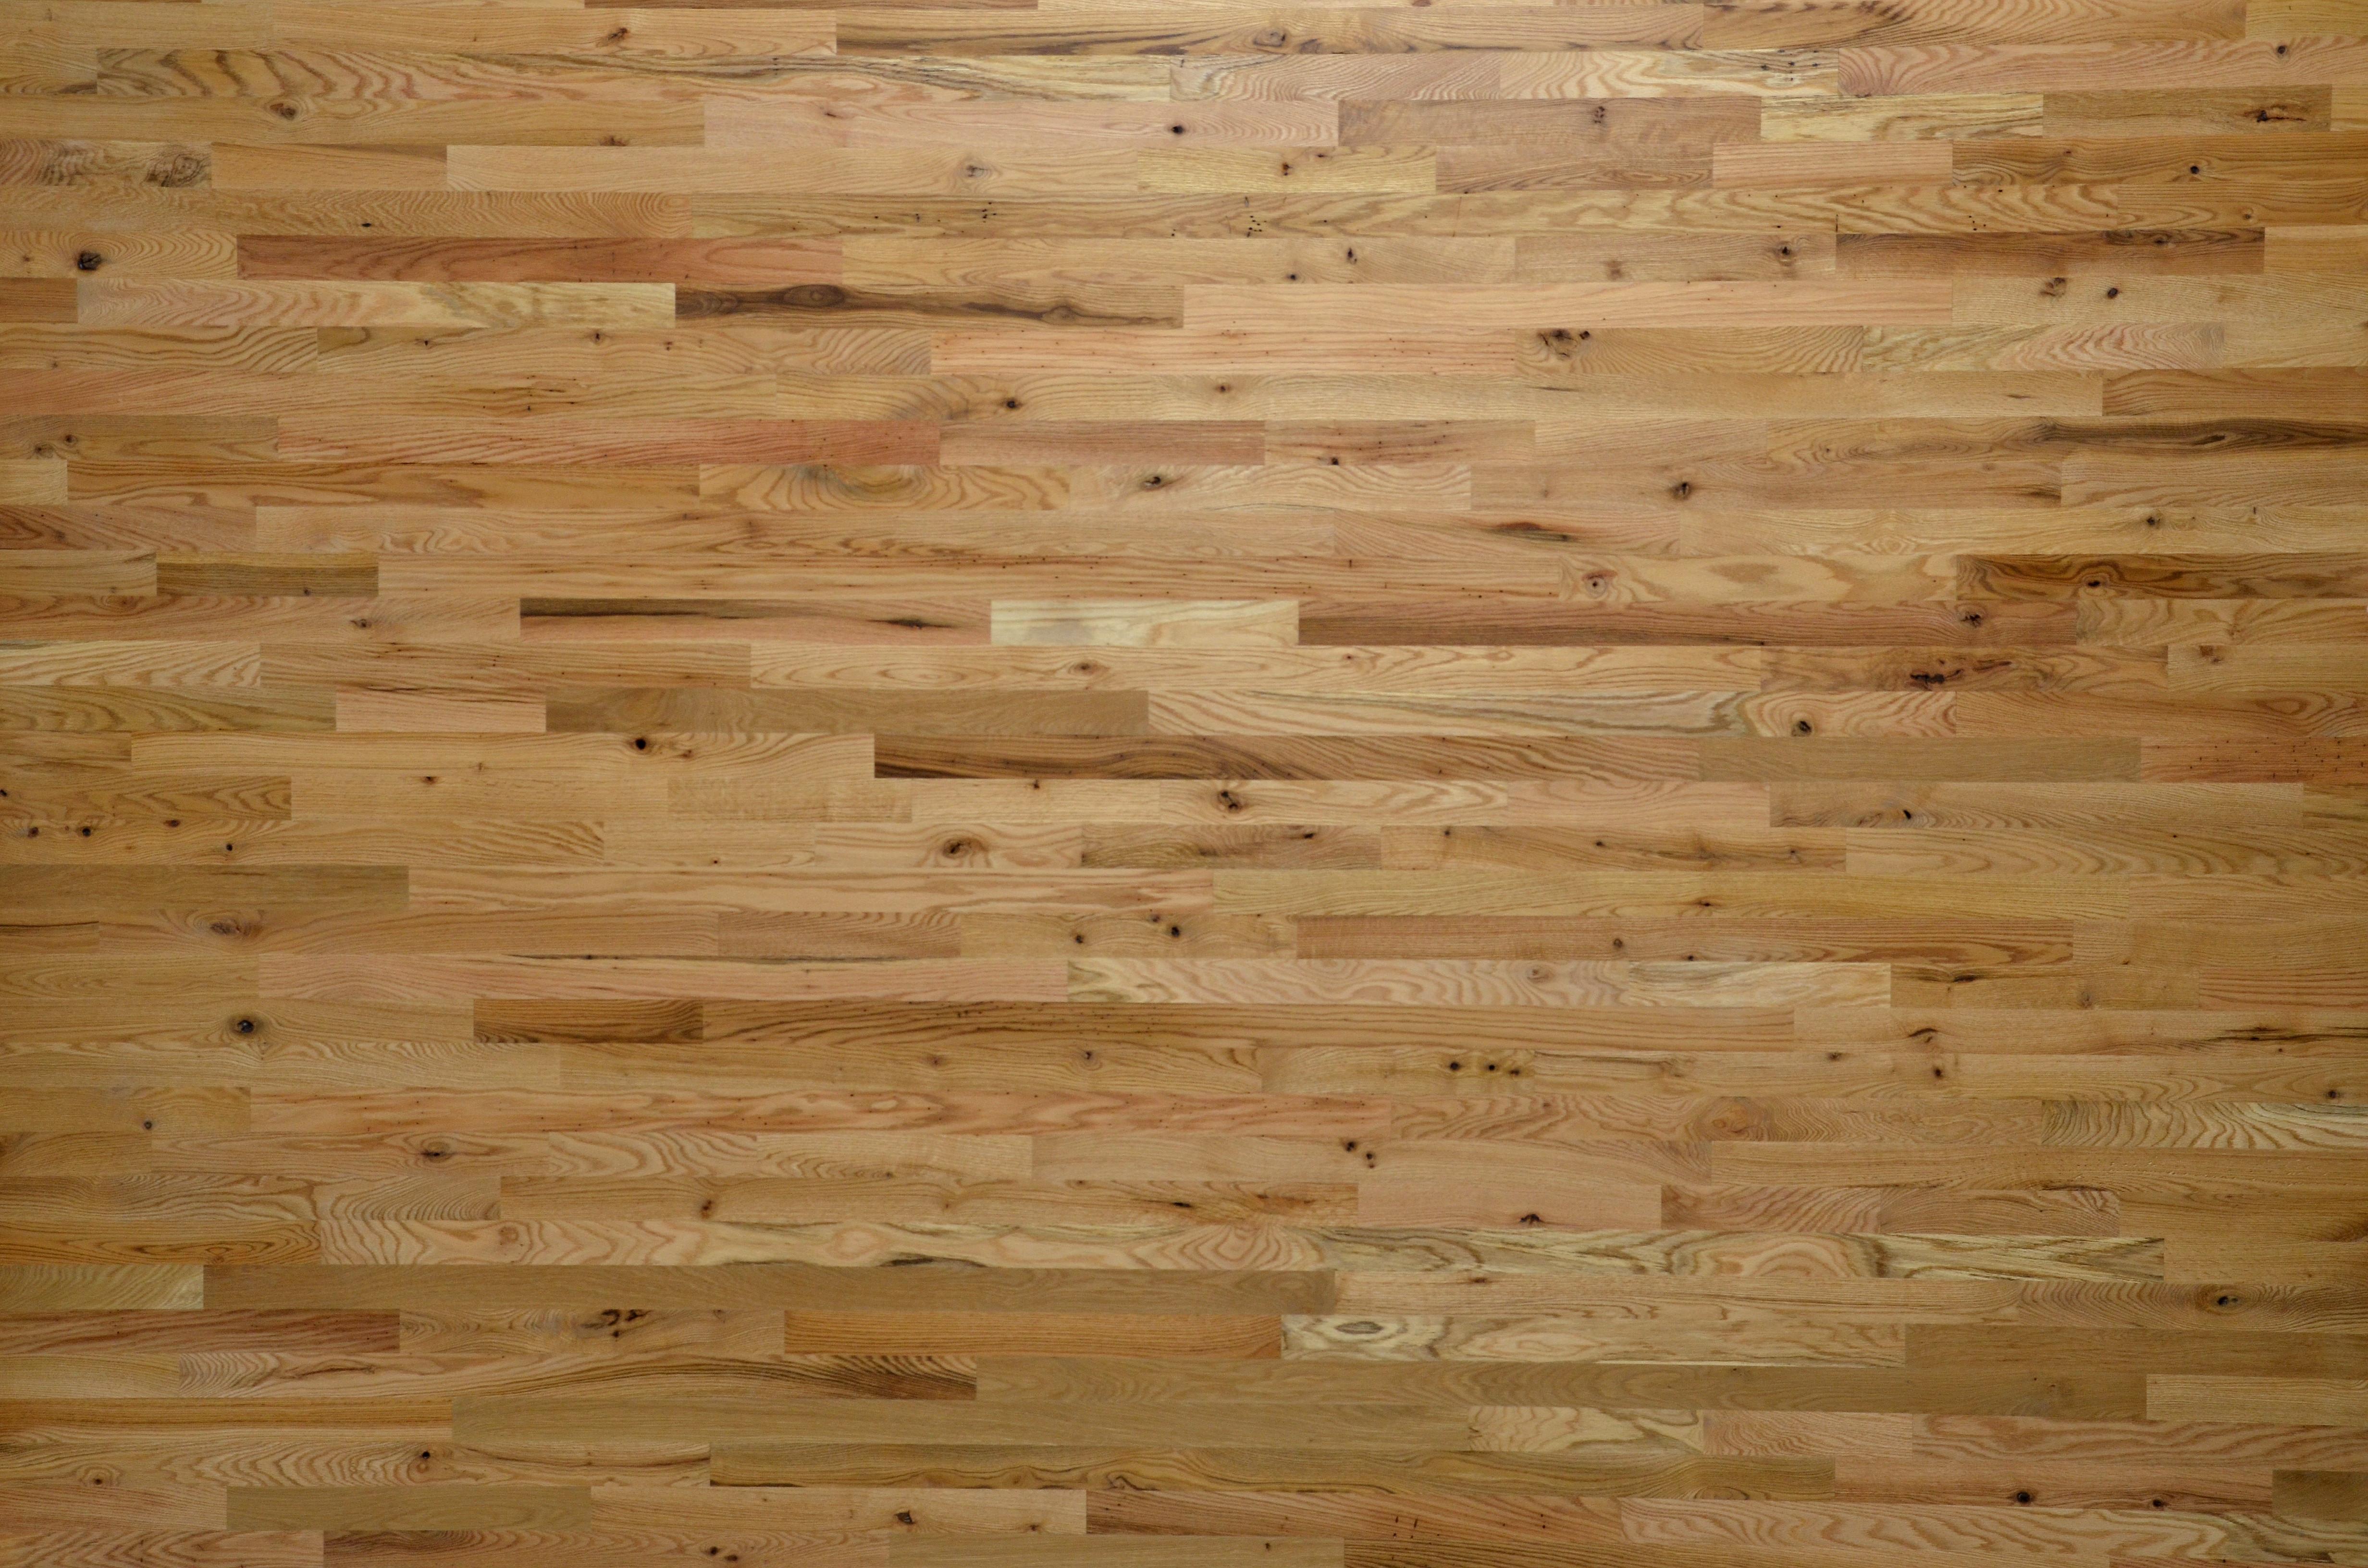 30 Ideal Hardwood Flooring Phoenix Az 2021 free download hardwood flooring phoenix az of lacrosse hardwood flooring walnut white oak red oak hickory with regard to 2 common red oak